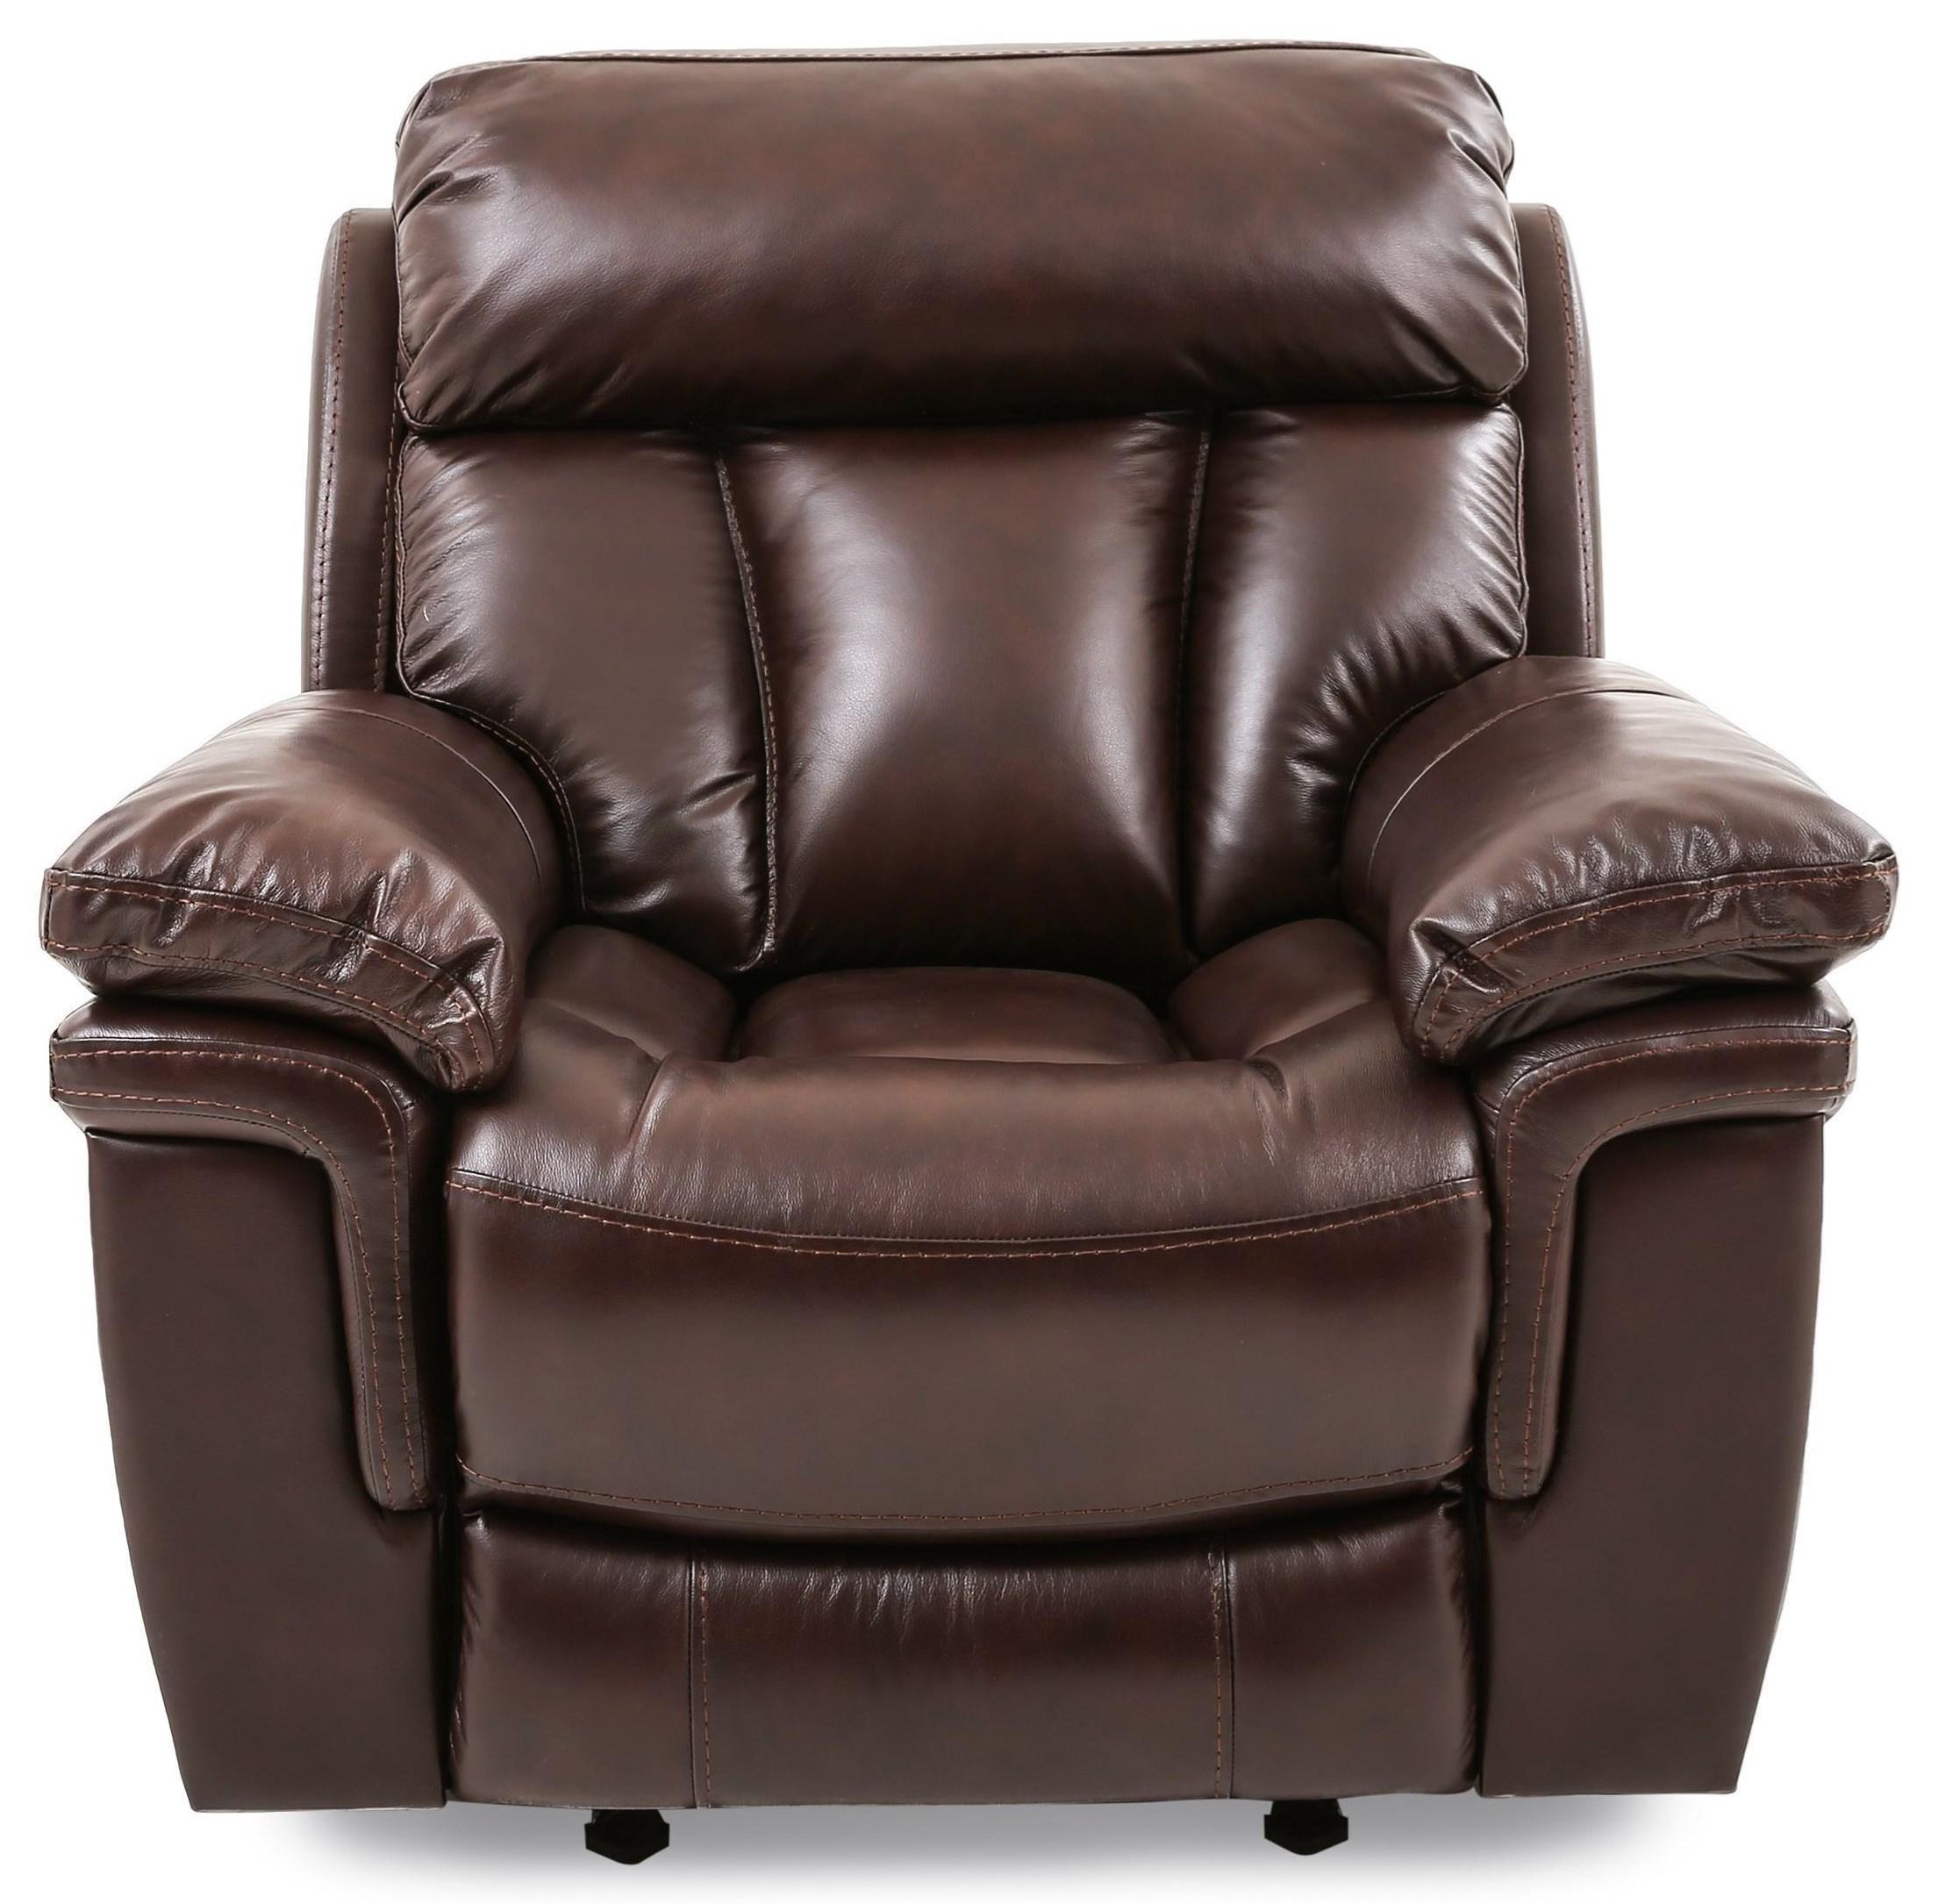 Bryant LEATHER GLIDER RECLINER at Walker's Furniture